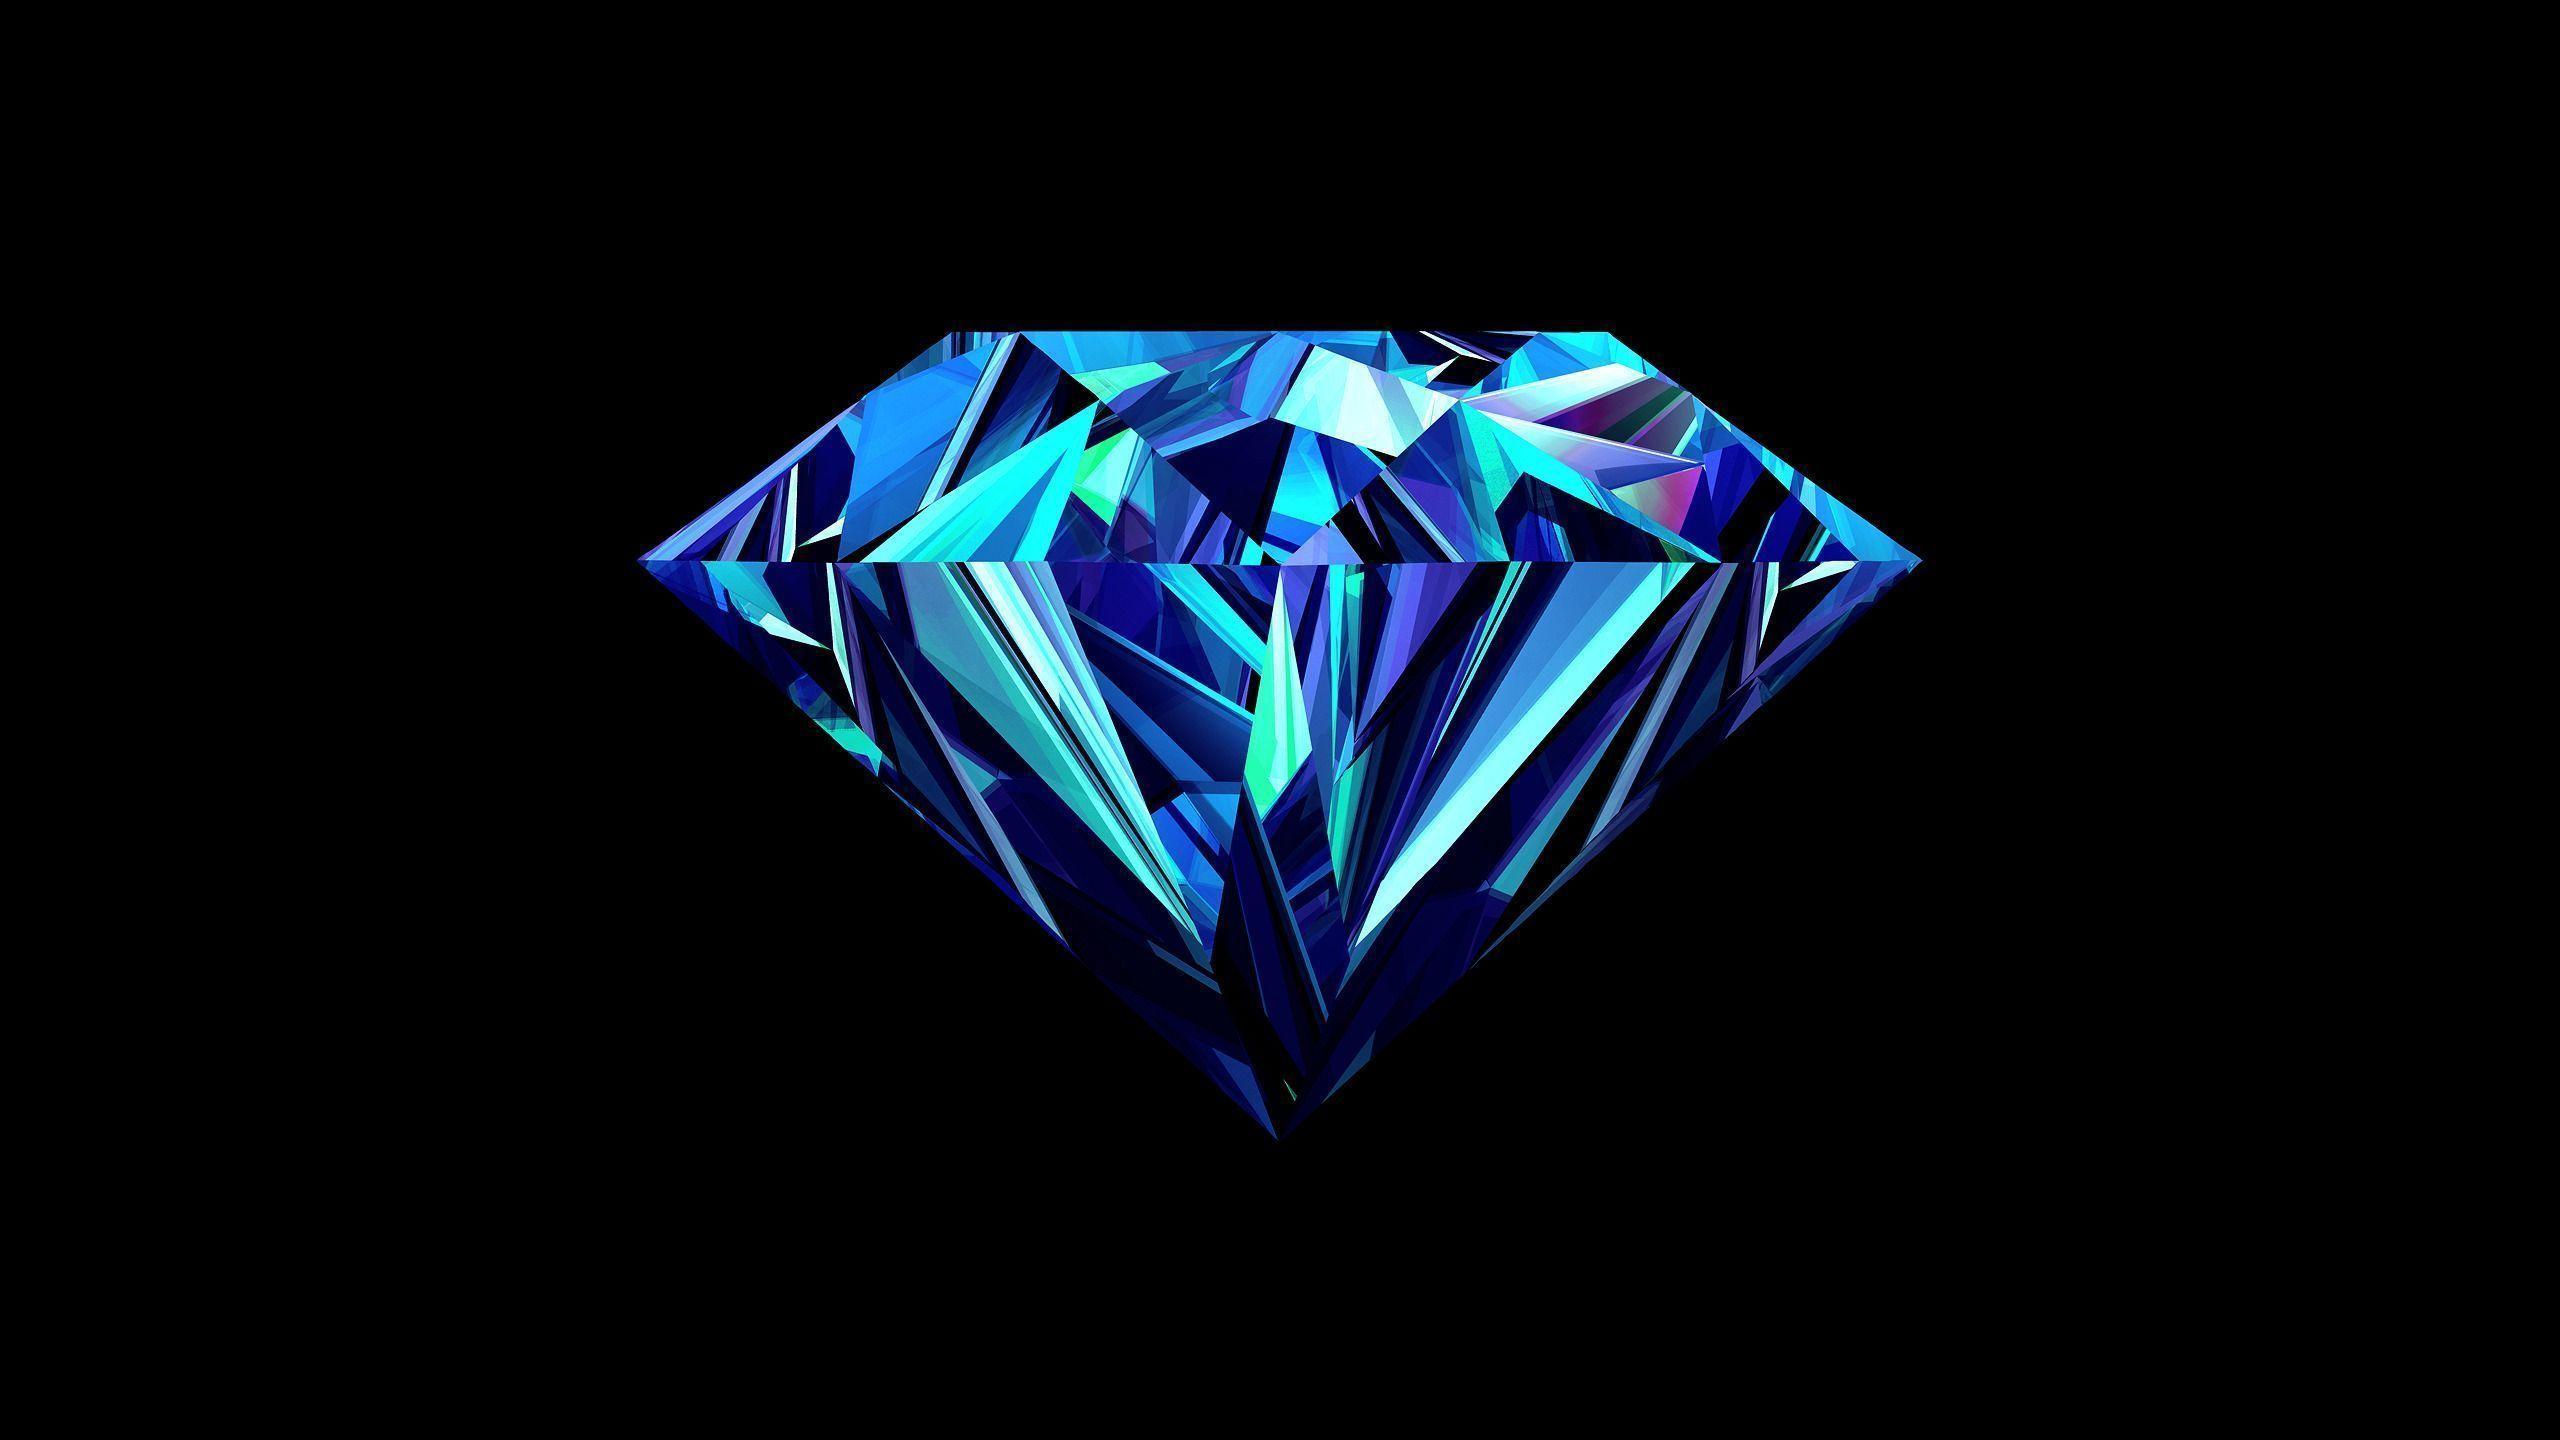 diamond wallpaper 02 - [2560x1440]